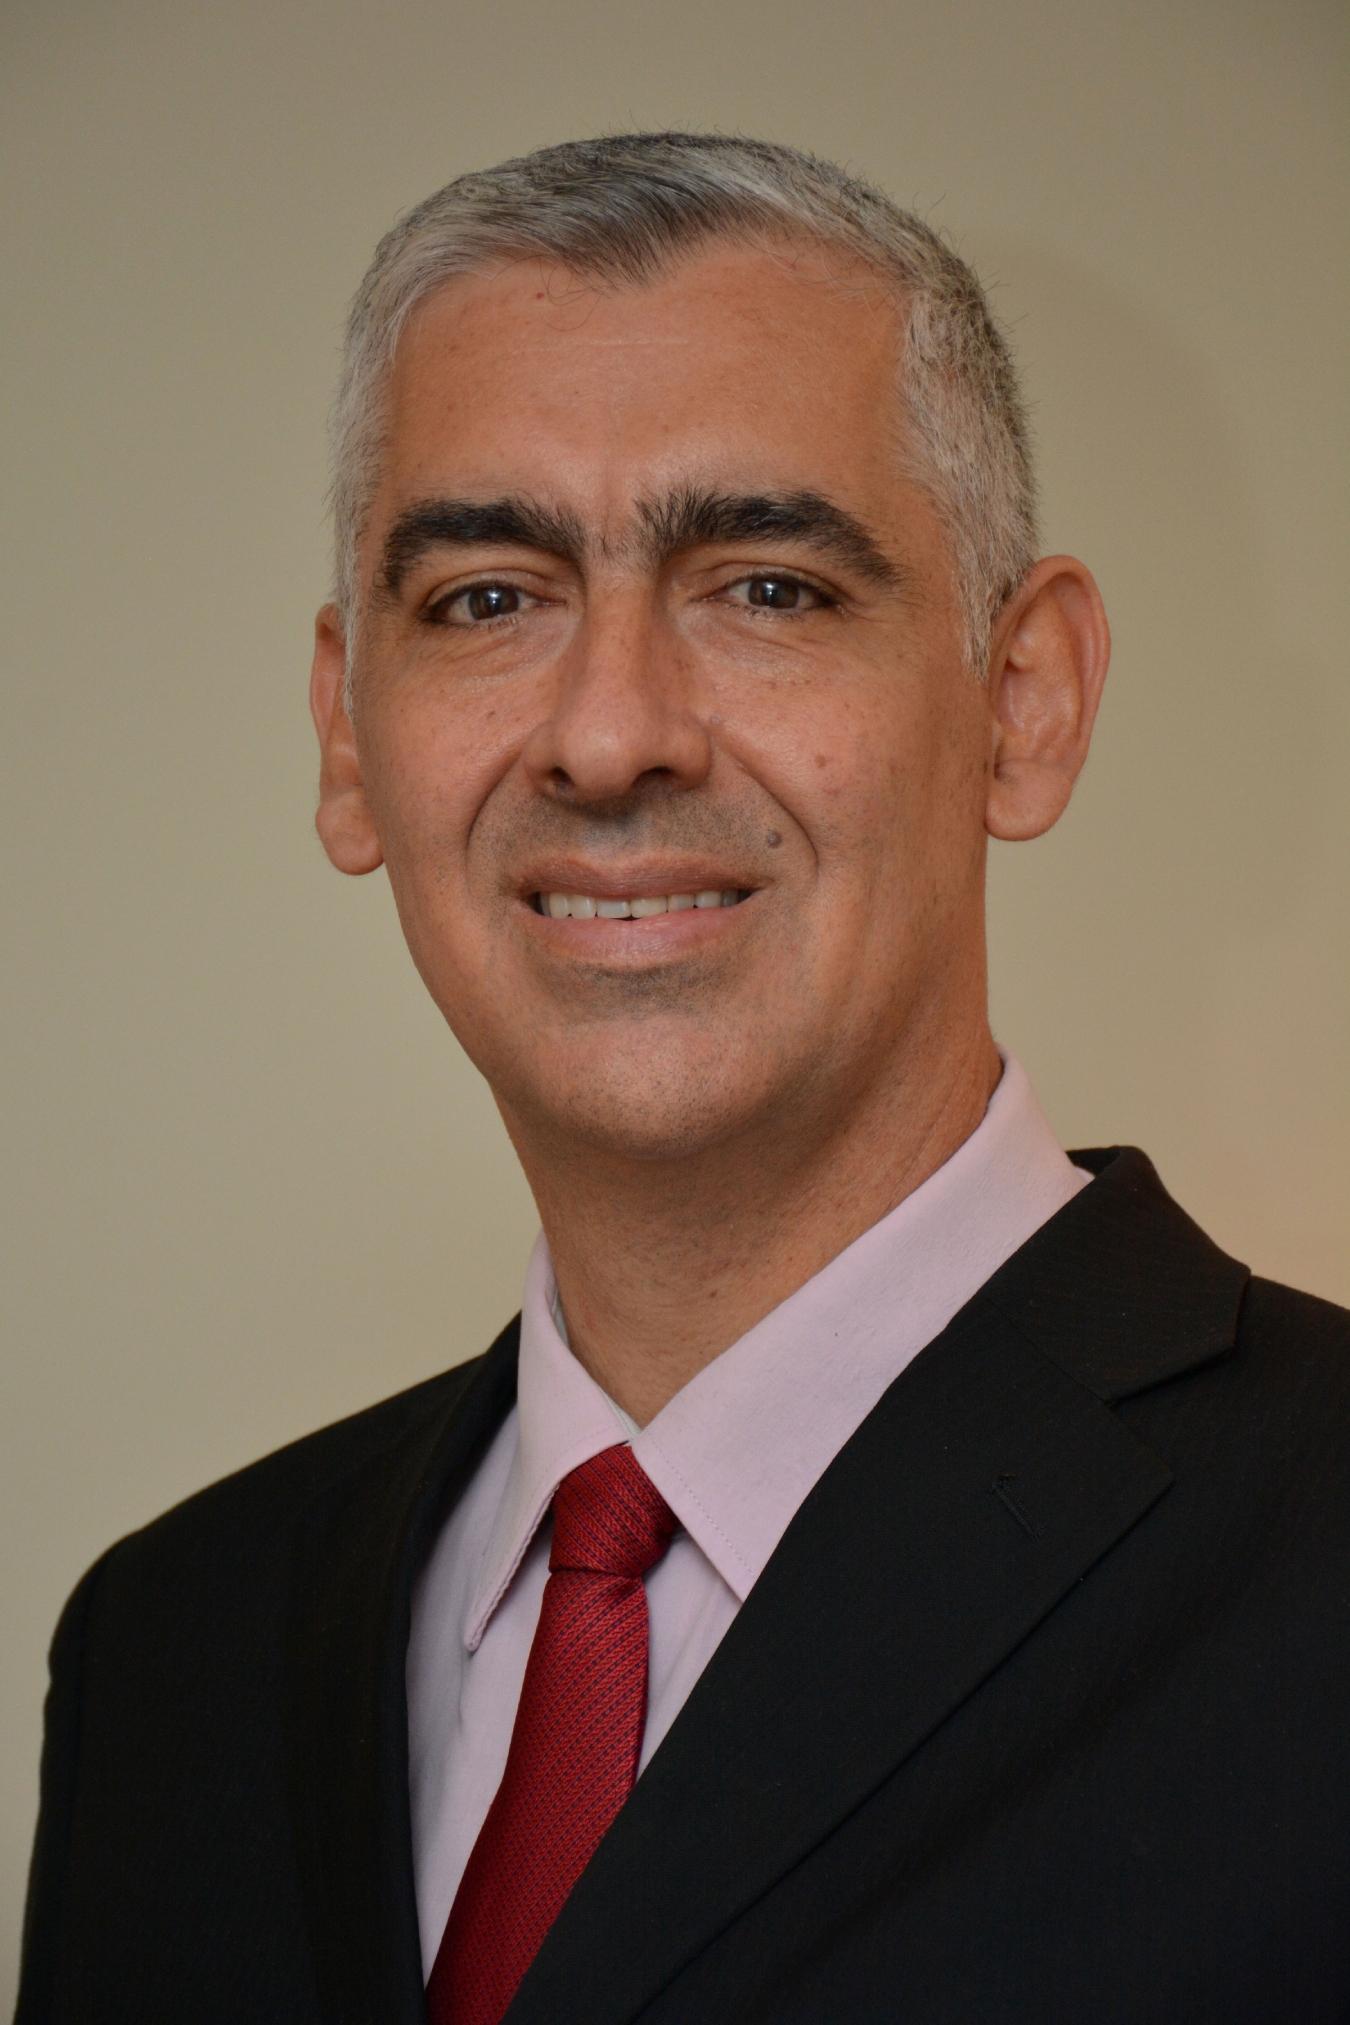 Cláudio Moyses